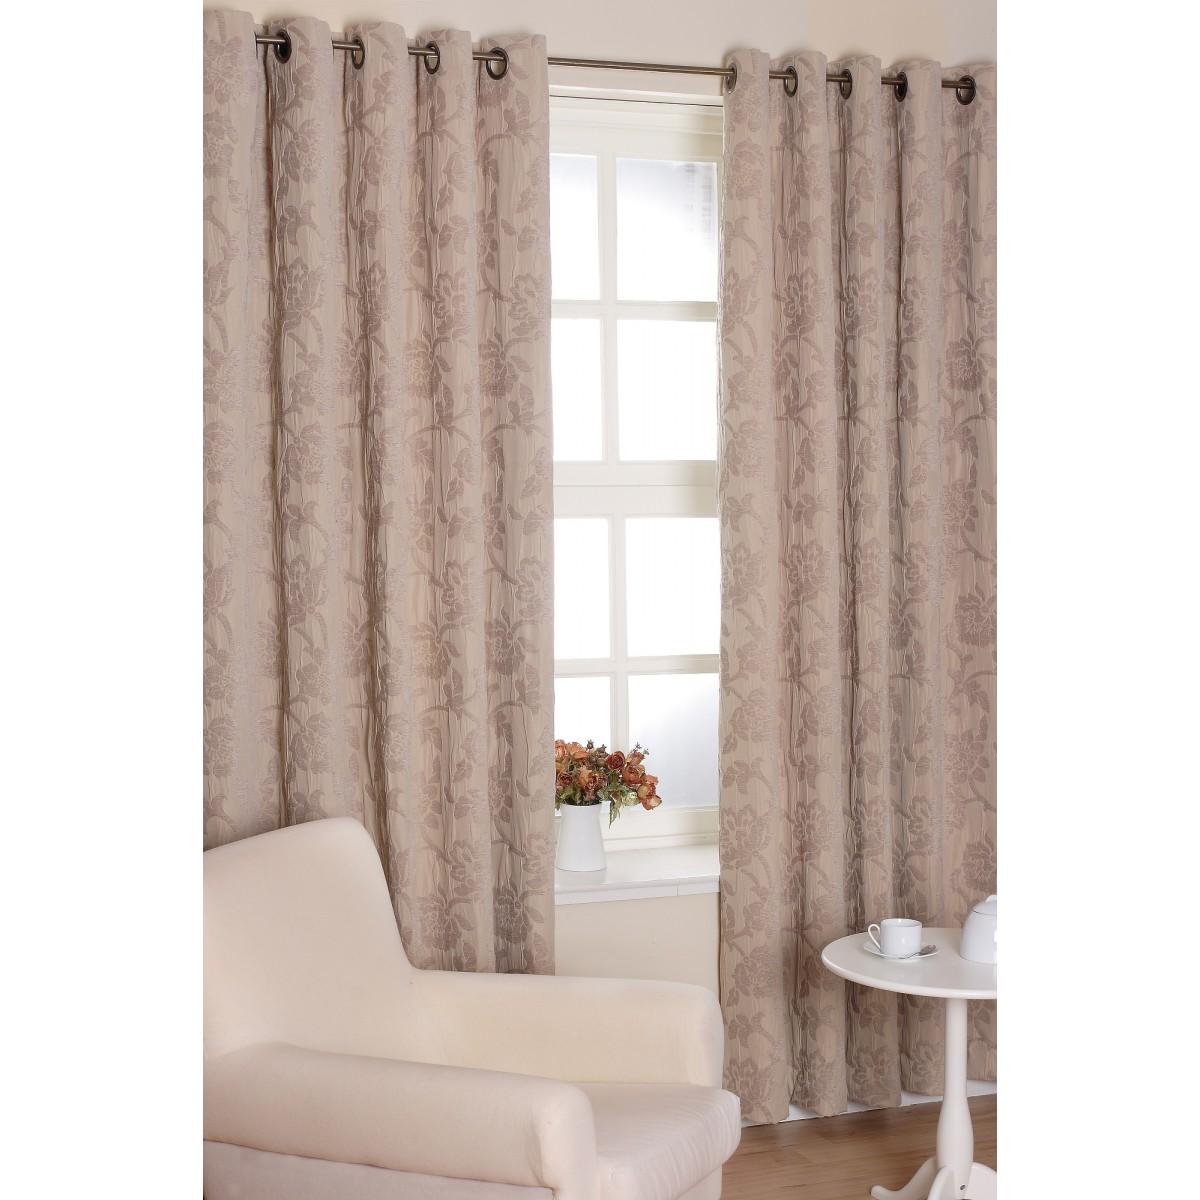 Sienna Taupe Slx Curtains